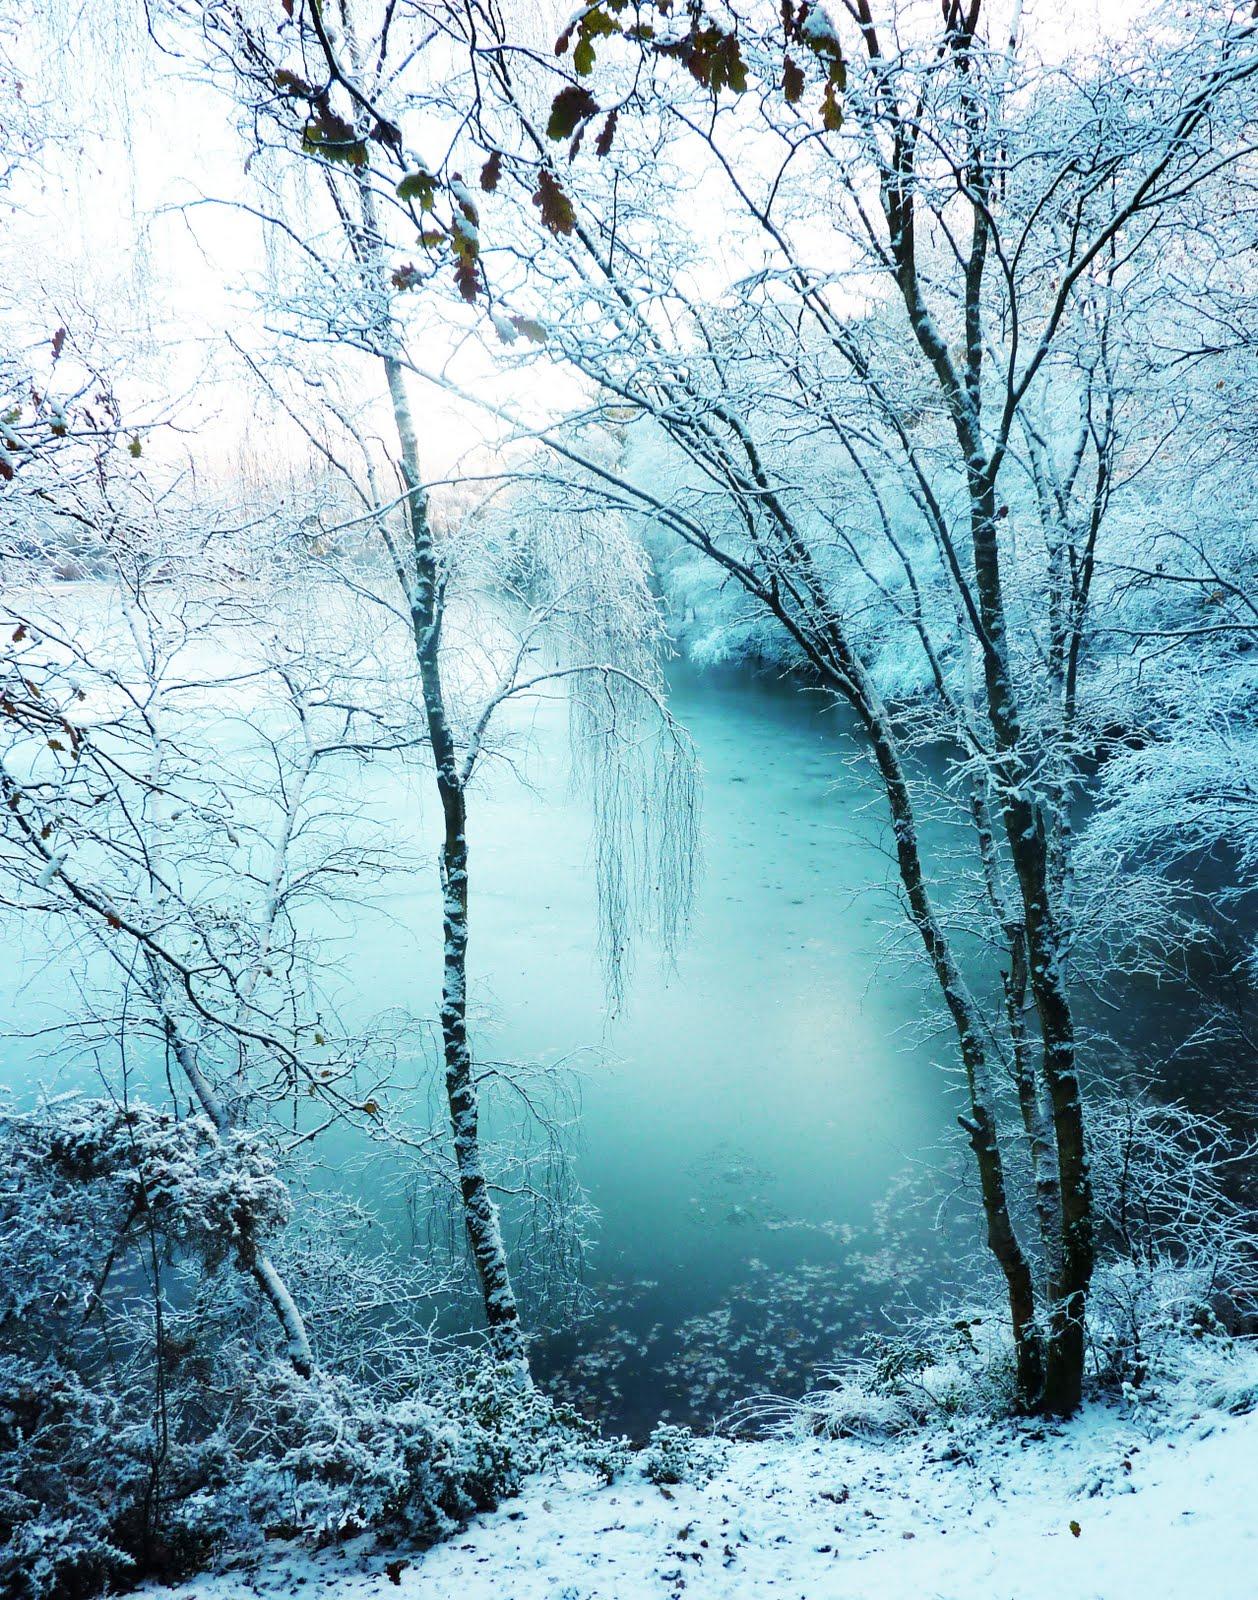 My Winter 2017 Capsule Wardrobe: Winona Harrod BA Hons: Winter Wonderland